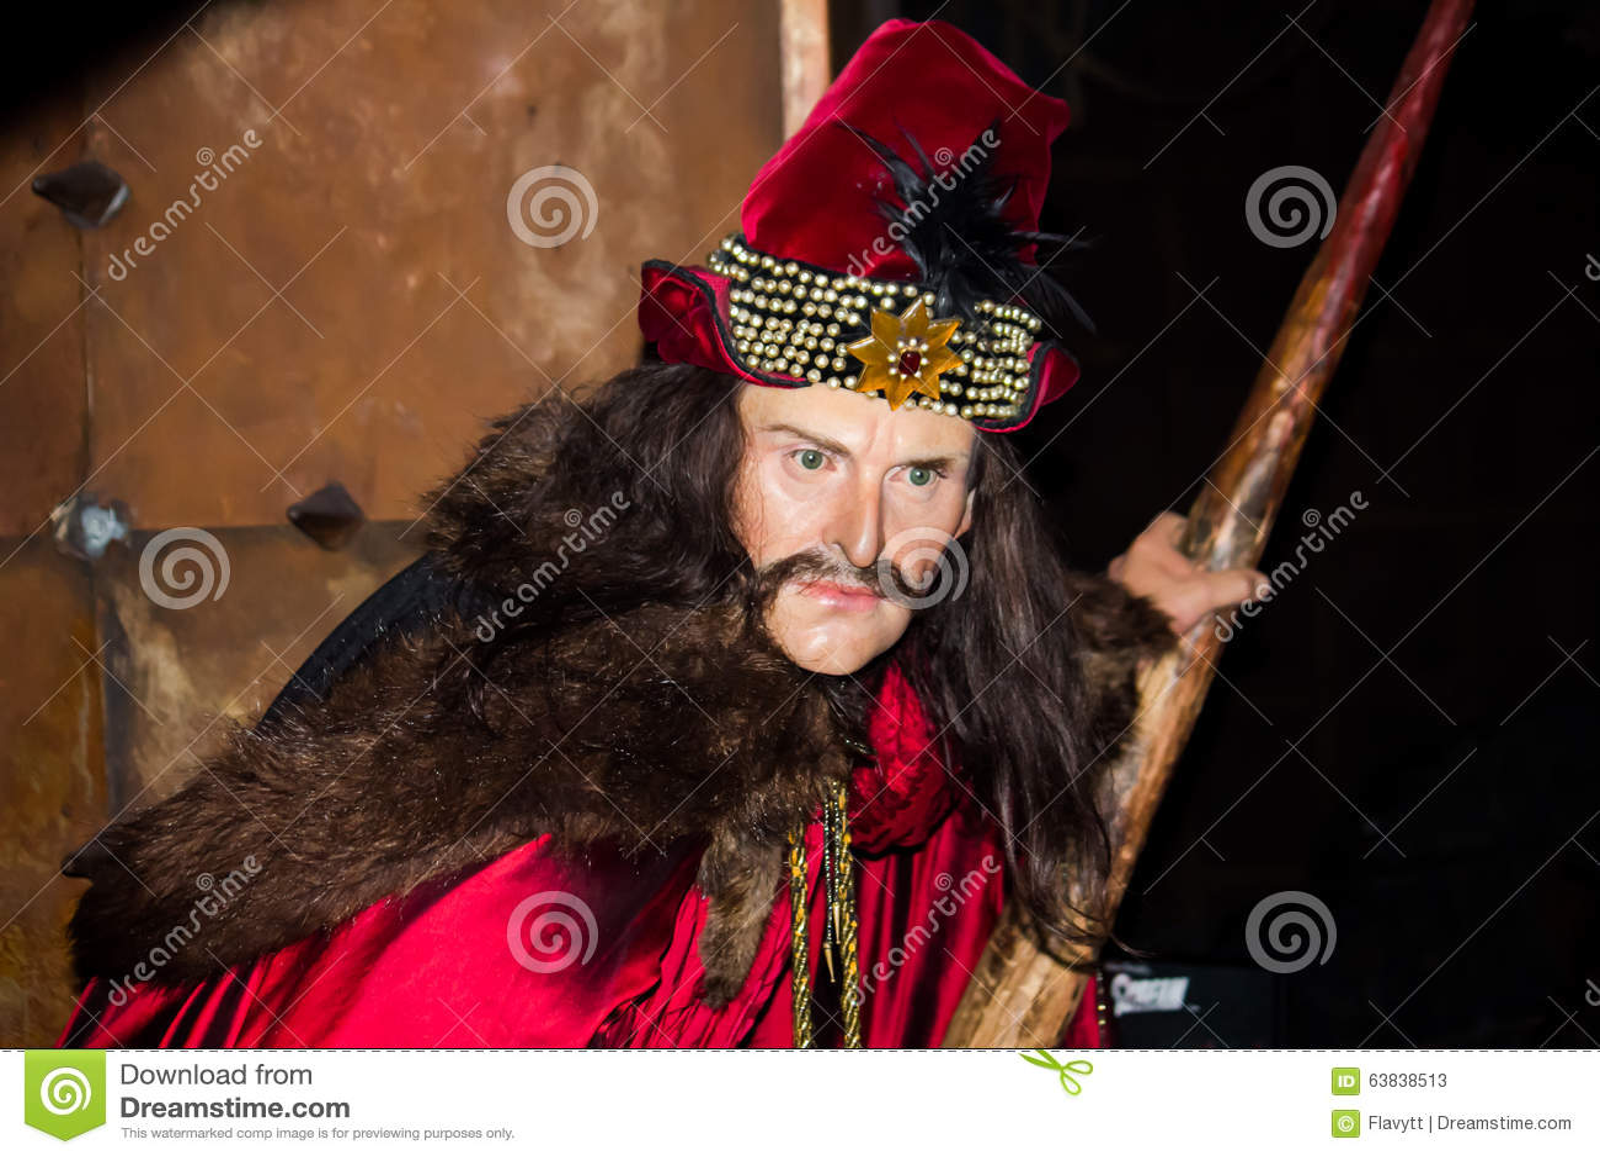 Vlad Impaleren